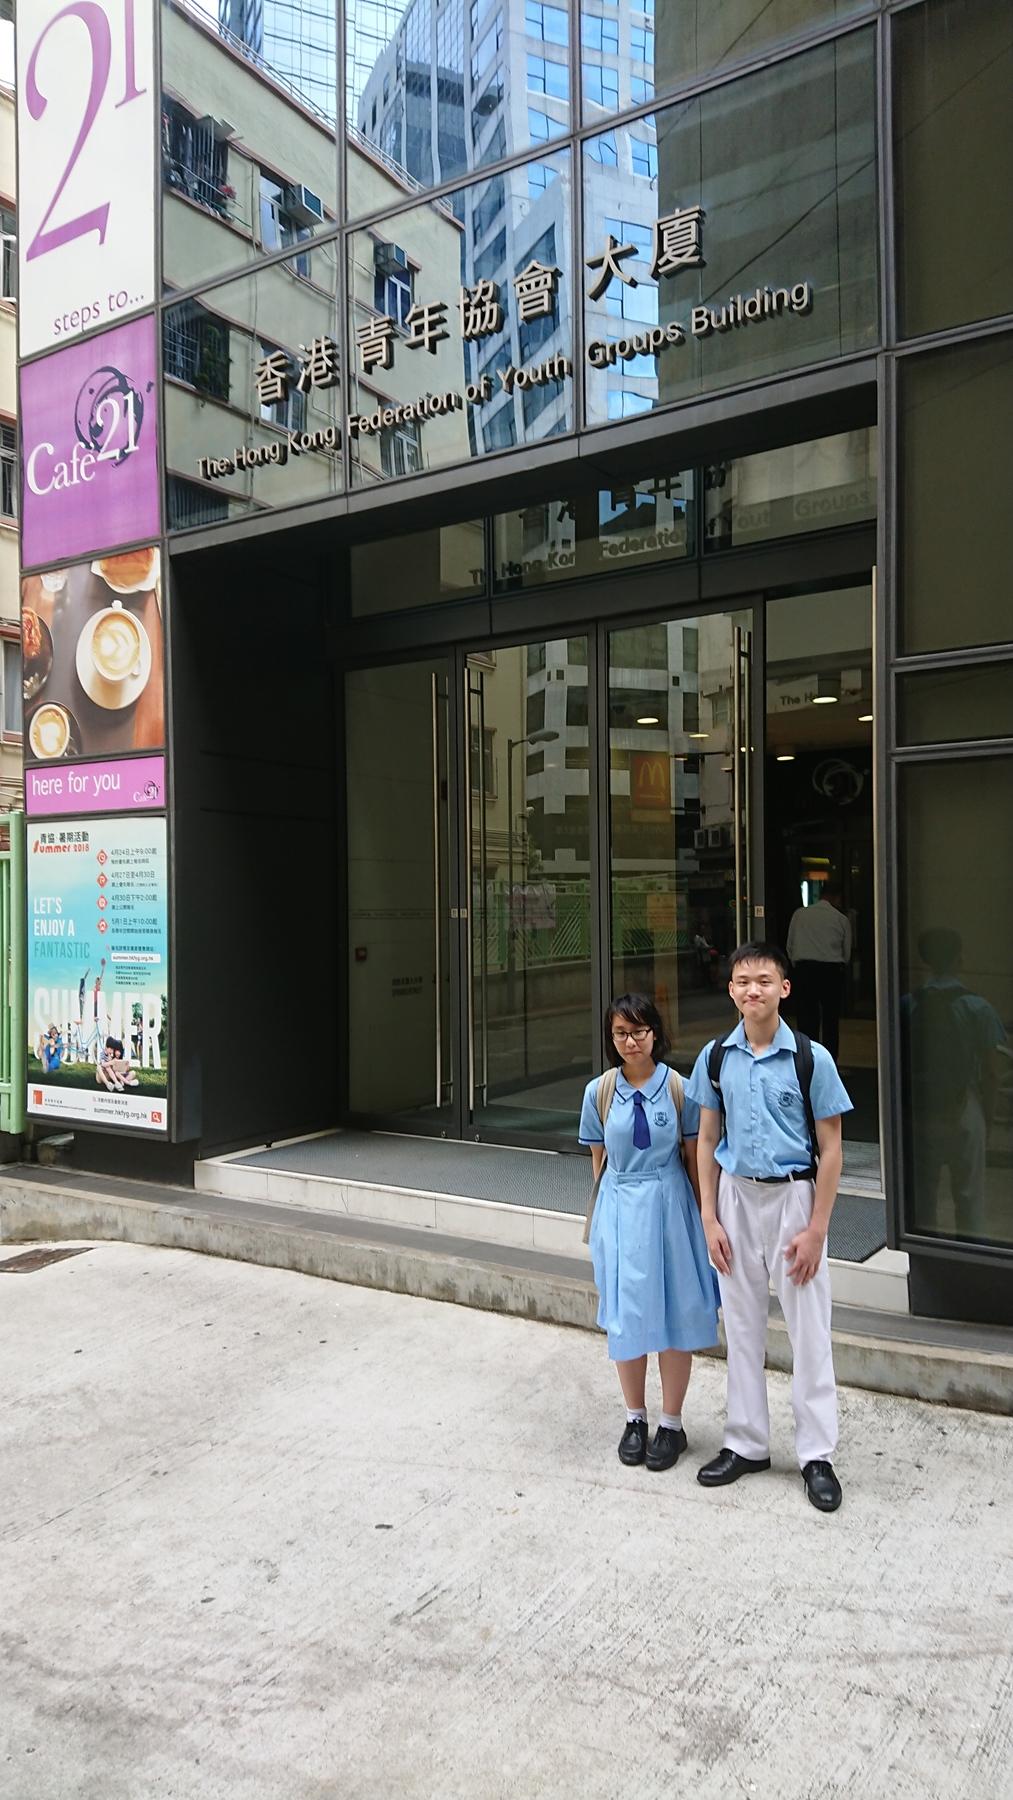 http://npc.edu.hk/sites/default/files/dsc_3002_1.jpg